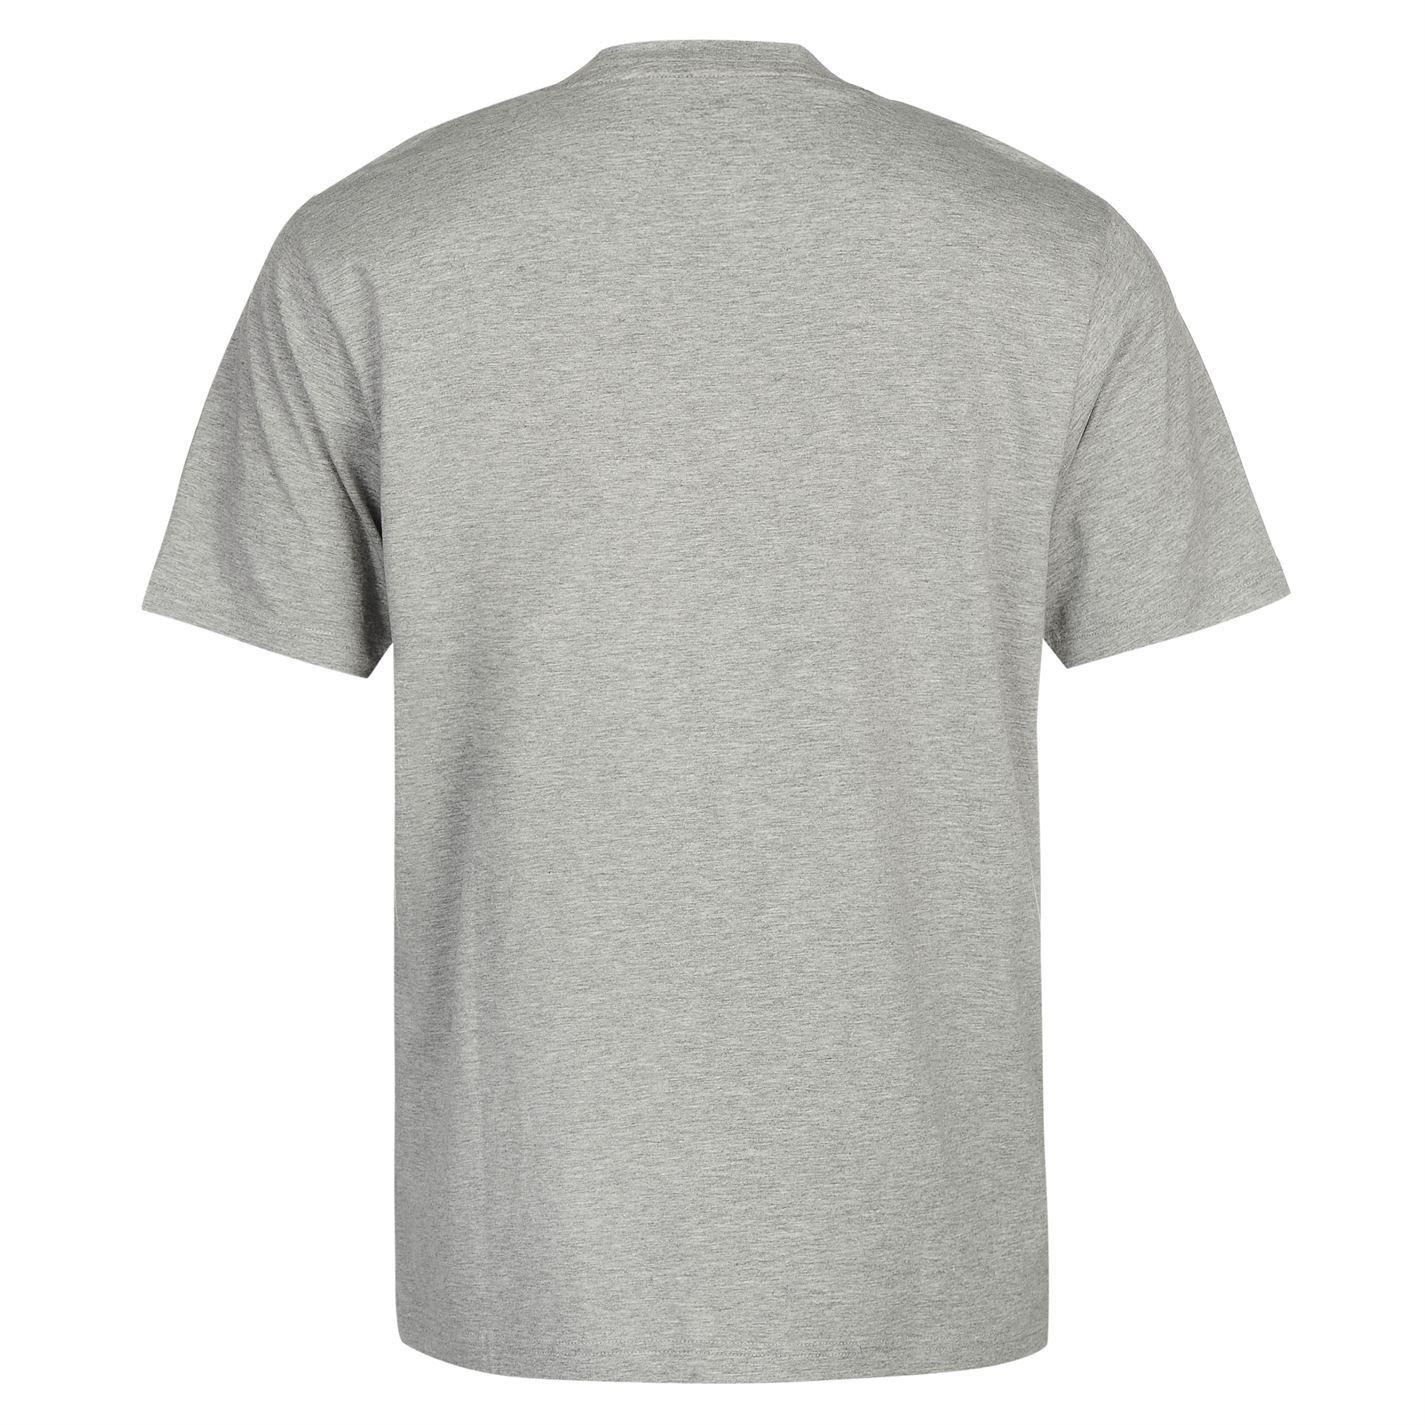 a9d41a976 Hot Tuna Surf Shack T-Shirt Mens Grey Casual Wear Top Tee Shirt Medium:  Amazon.co.uk: Clothing